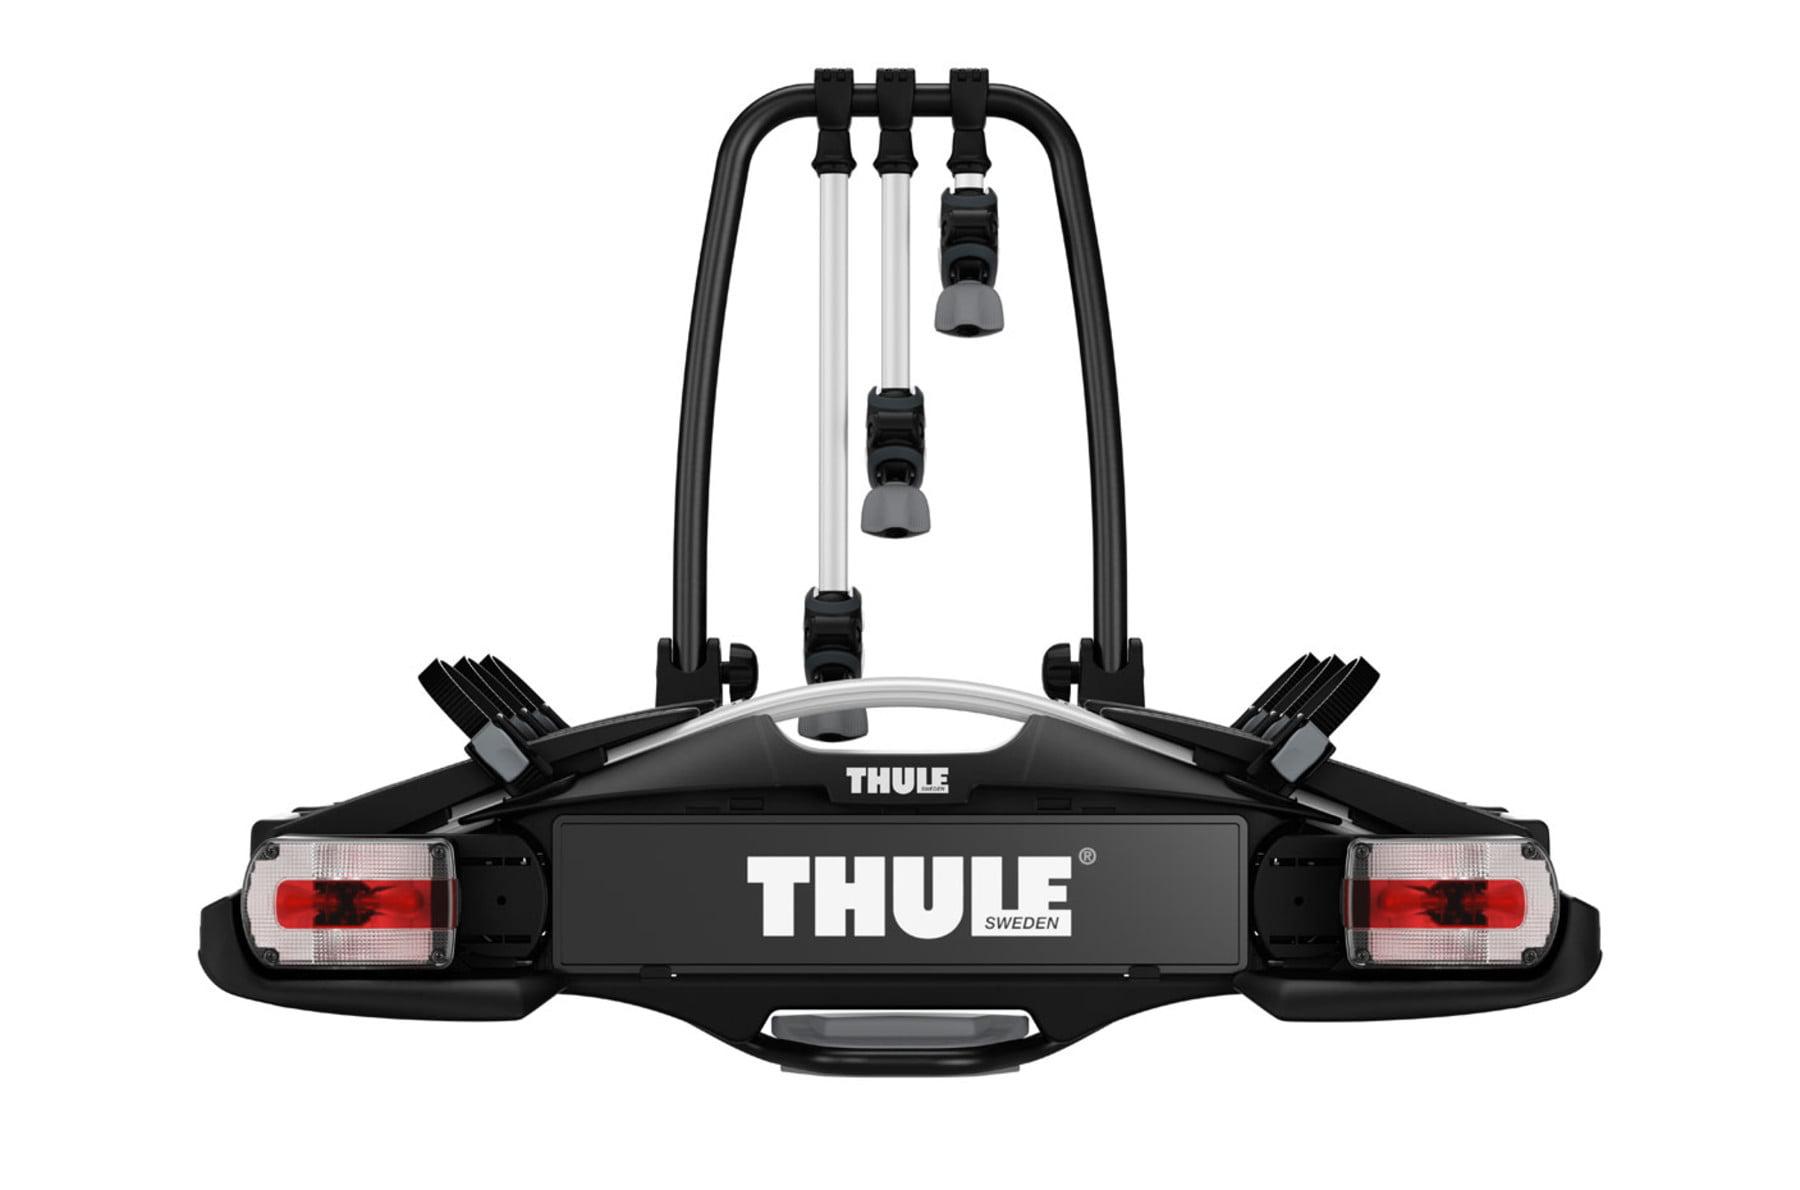 Suport biciclete Thule VeloCompact 927 cu prindere pe carligul de remorcare 7